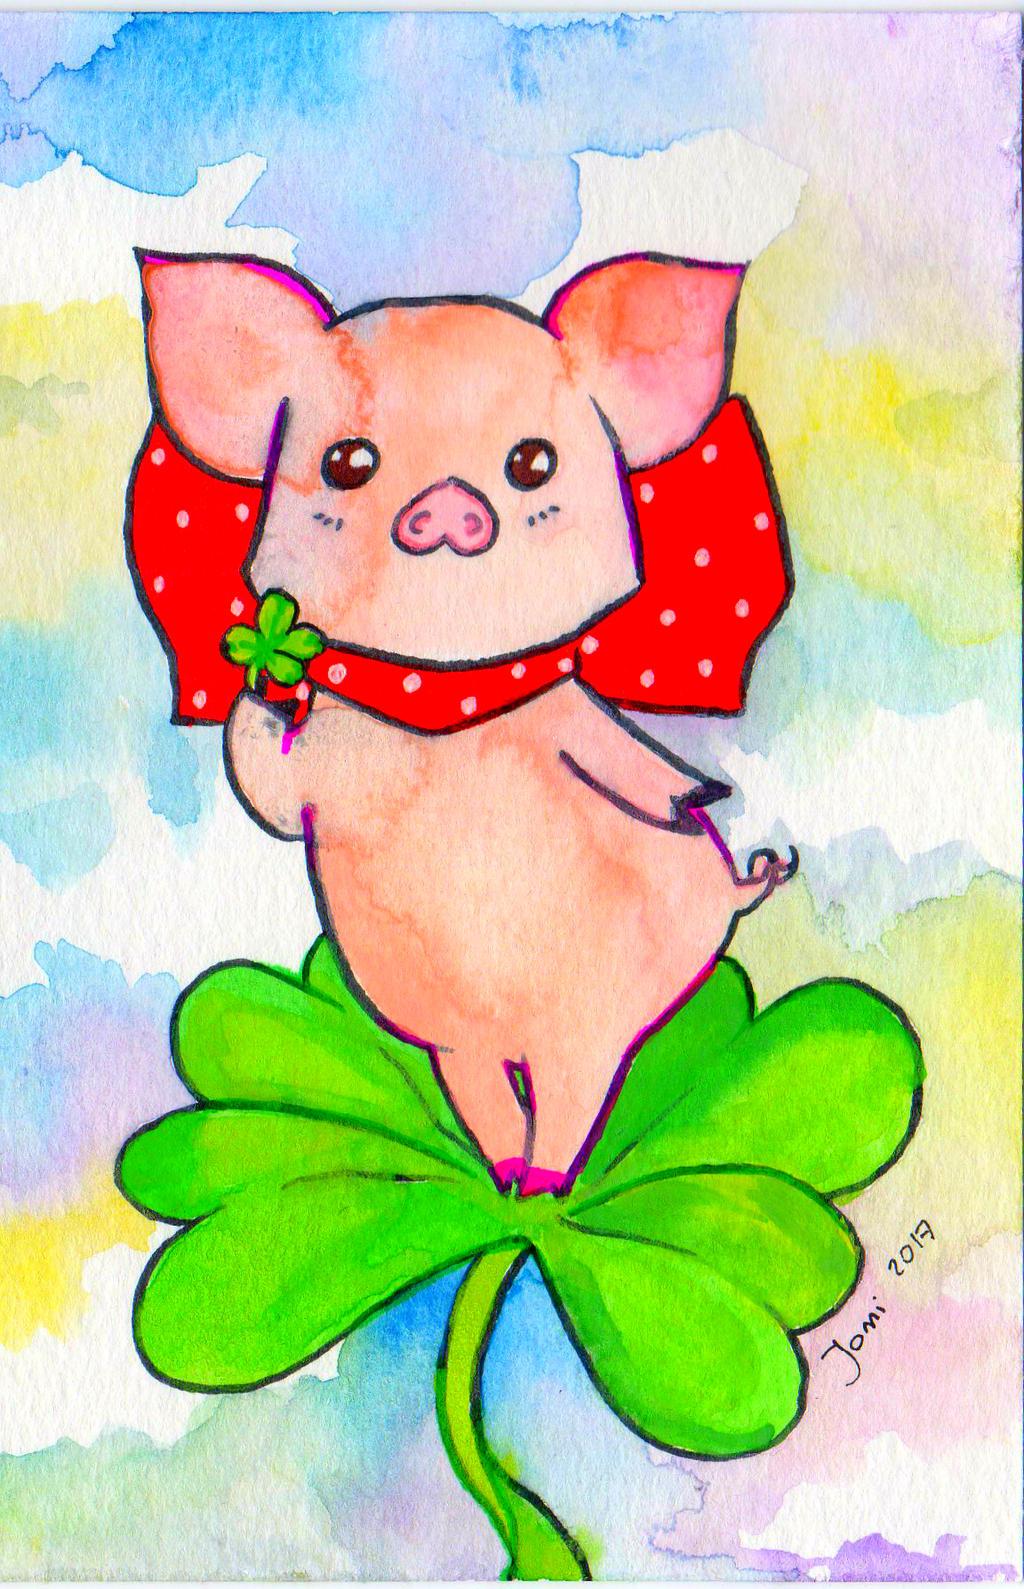 Cute Piggy 2017 by NanakoHarrison